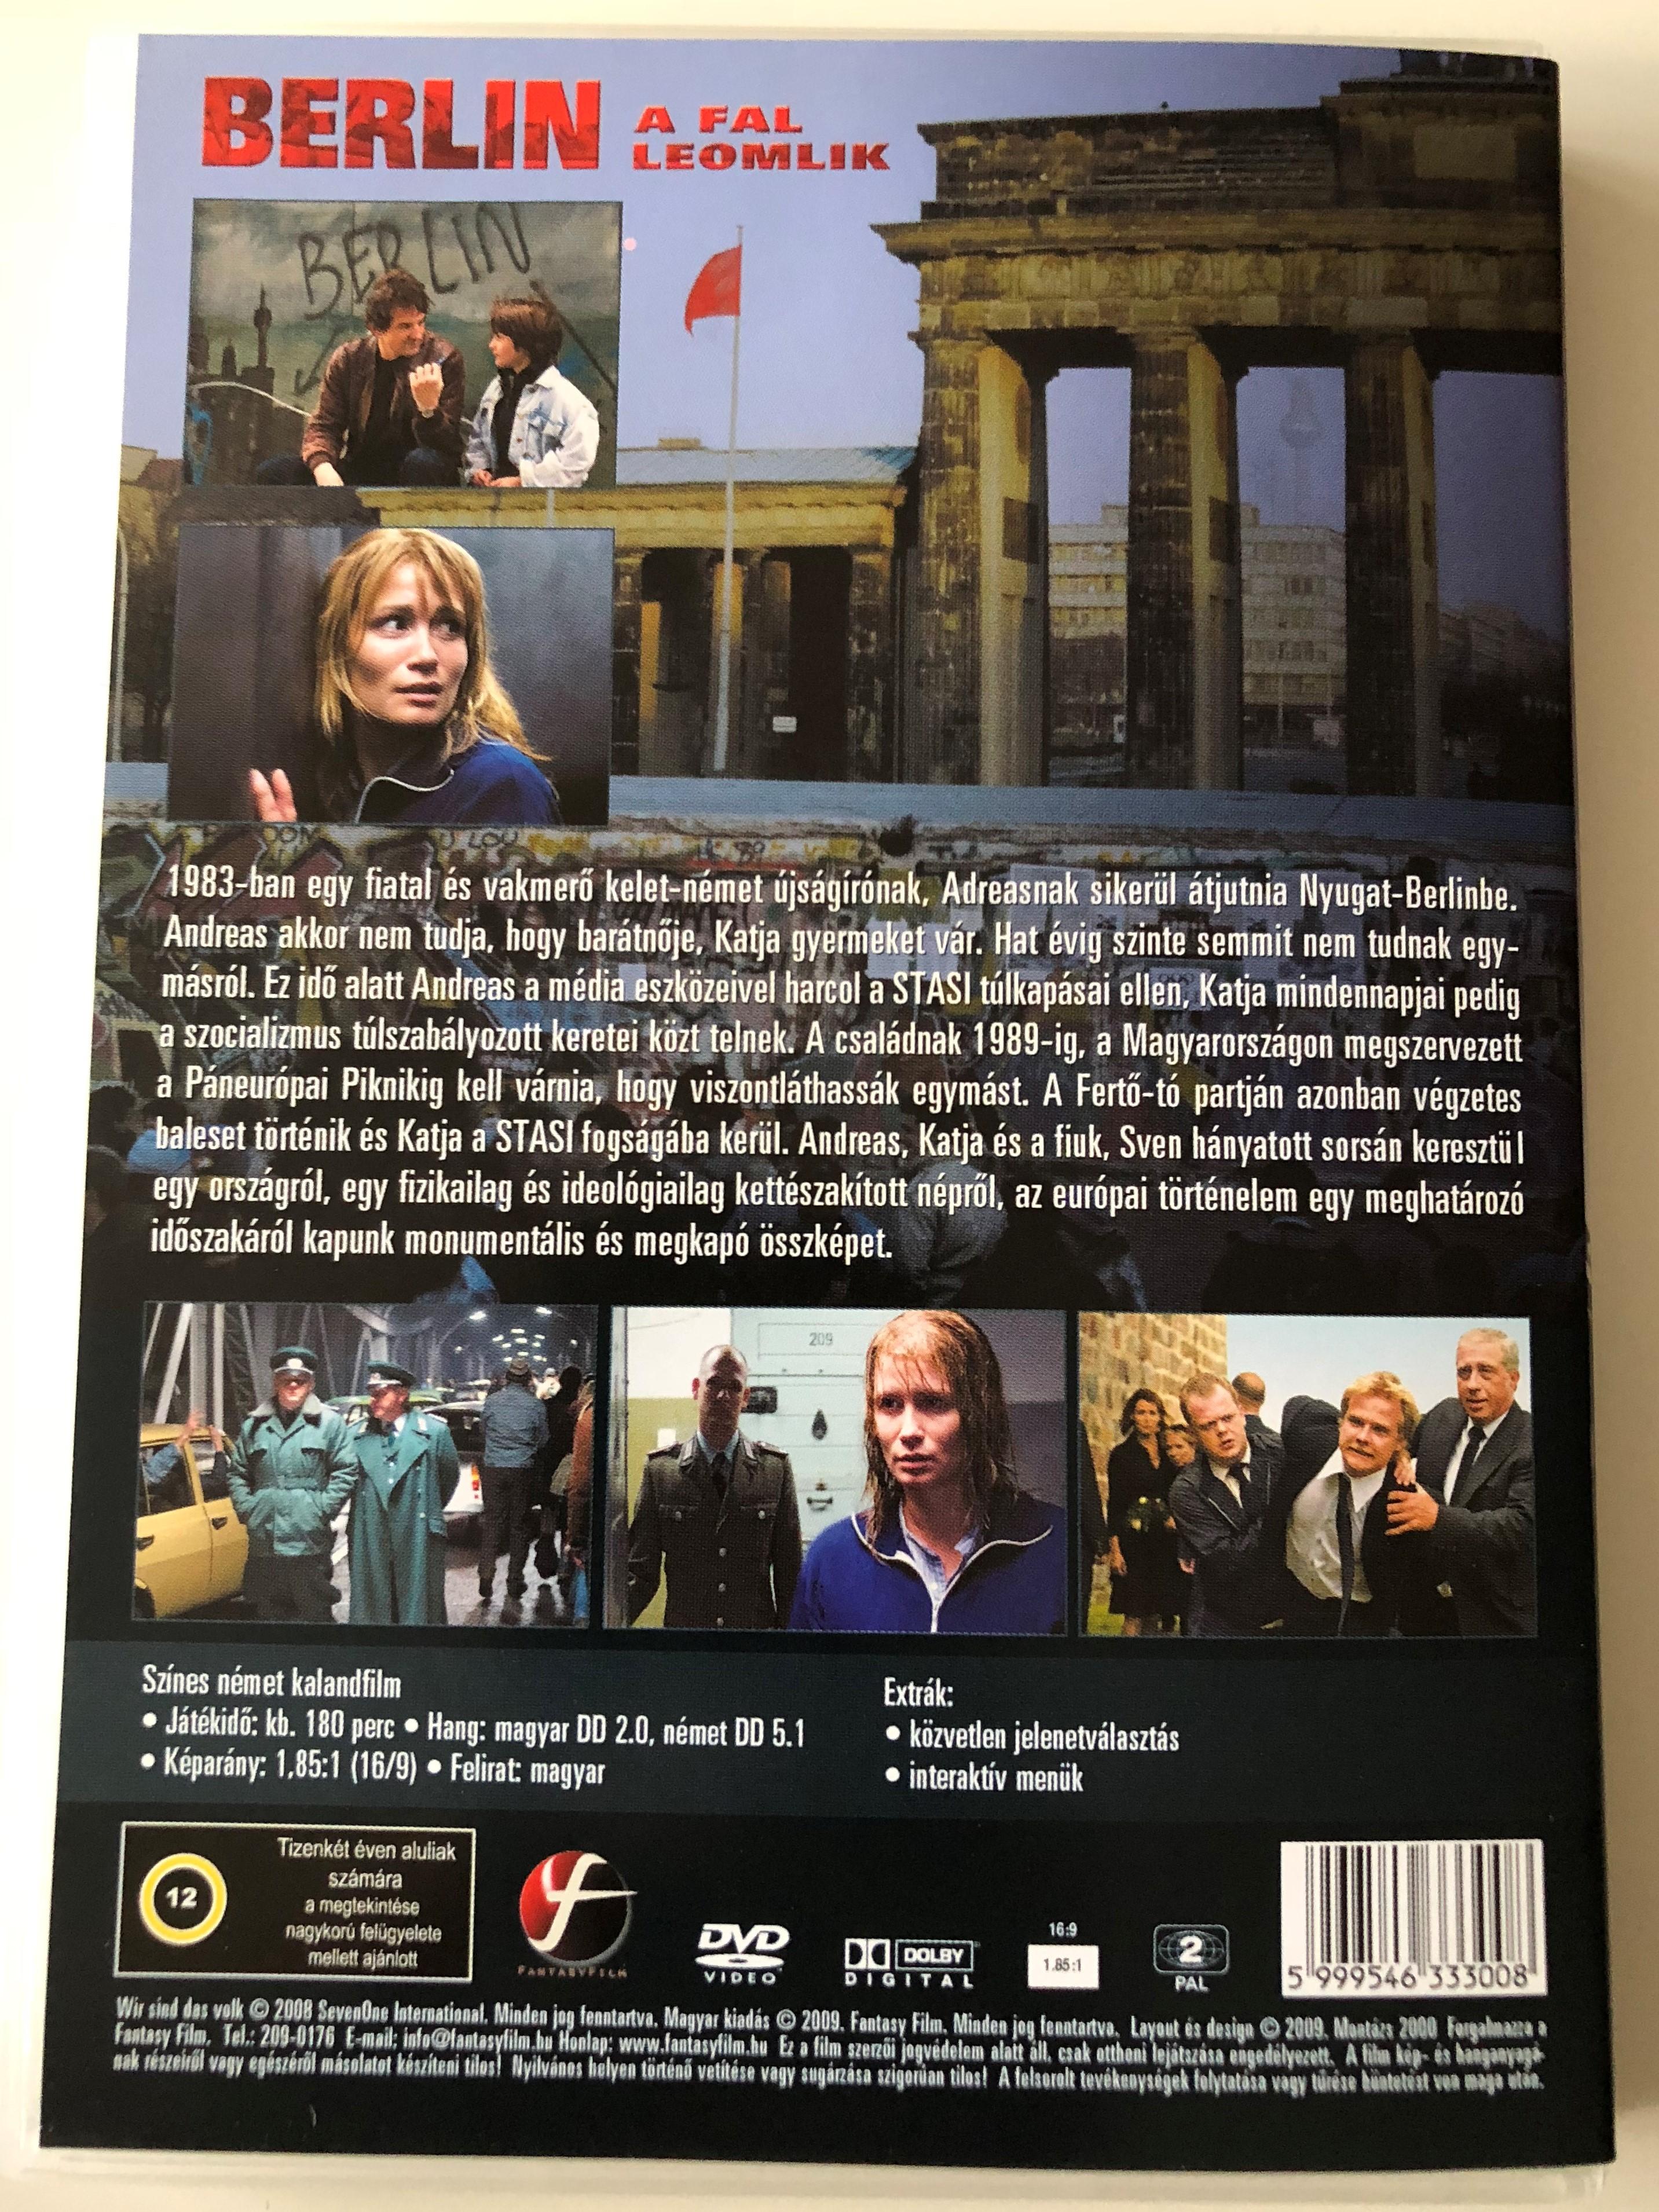 berlin-a-fal-leomlik-dvd-2008-wir-sind-das-volk-the-final-days-directed-by-thomas-berger-starring-heiner-lauterbach-hans-werner-meyer-anja-kling-felicitas-woll-2-.jpg